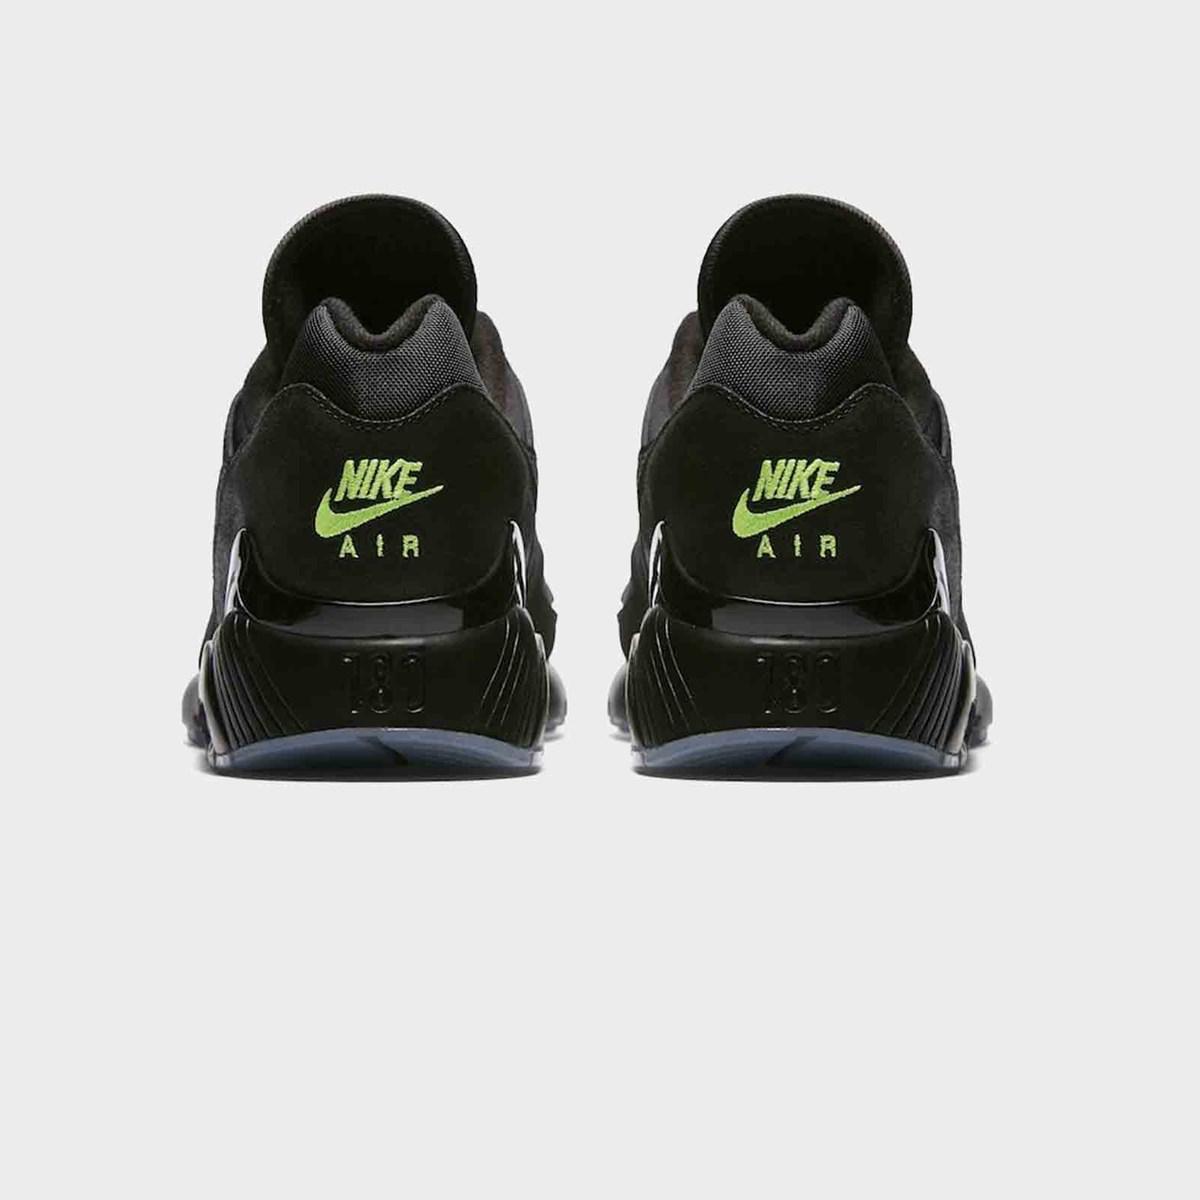 Nike Air Max 180 Night Ops - Aq6104-001